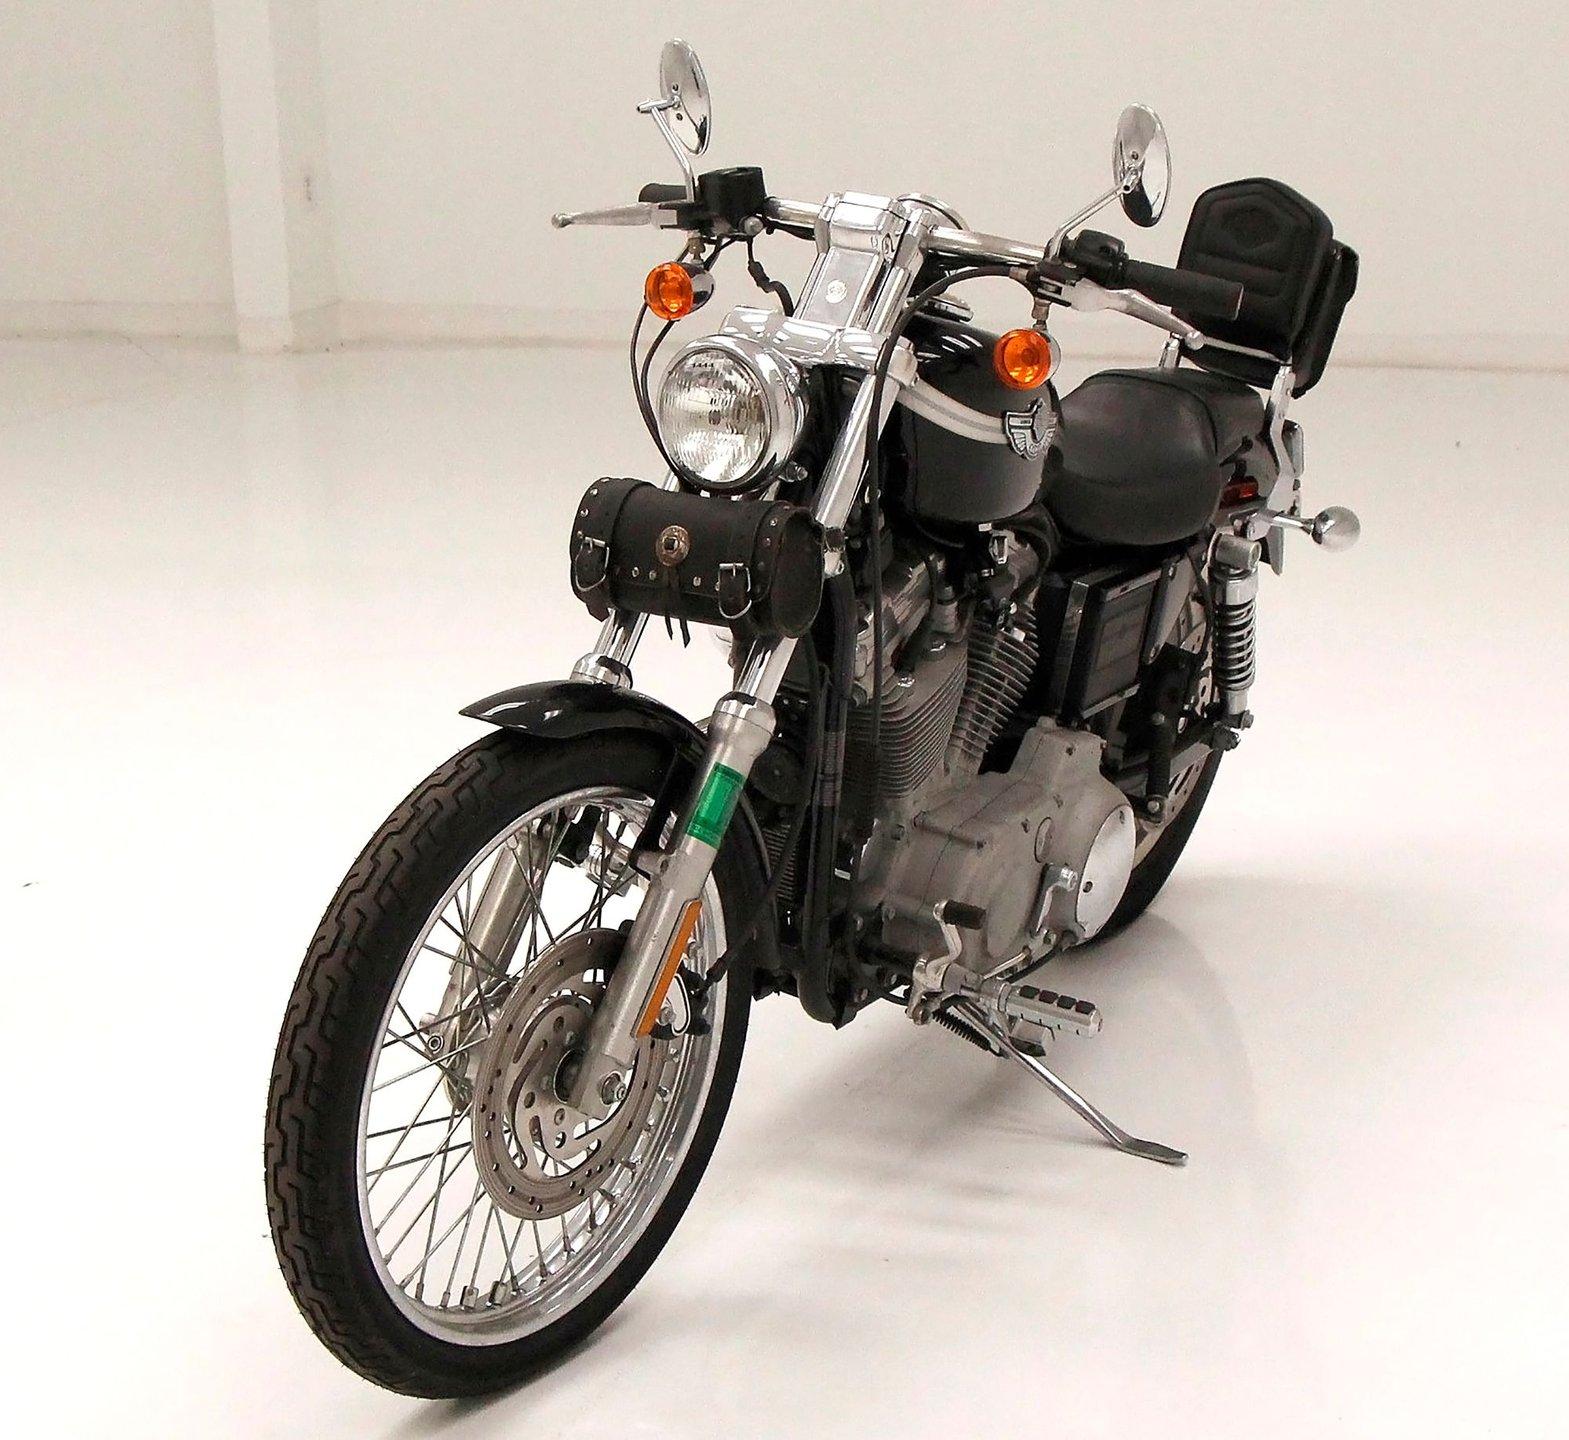 2003 Harley Davidson 883 Sportster